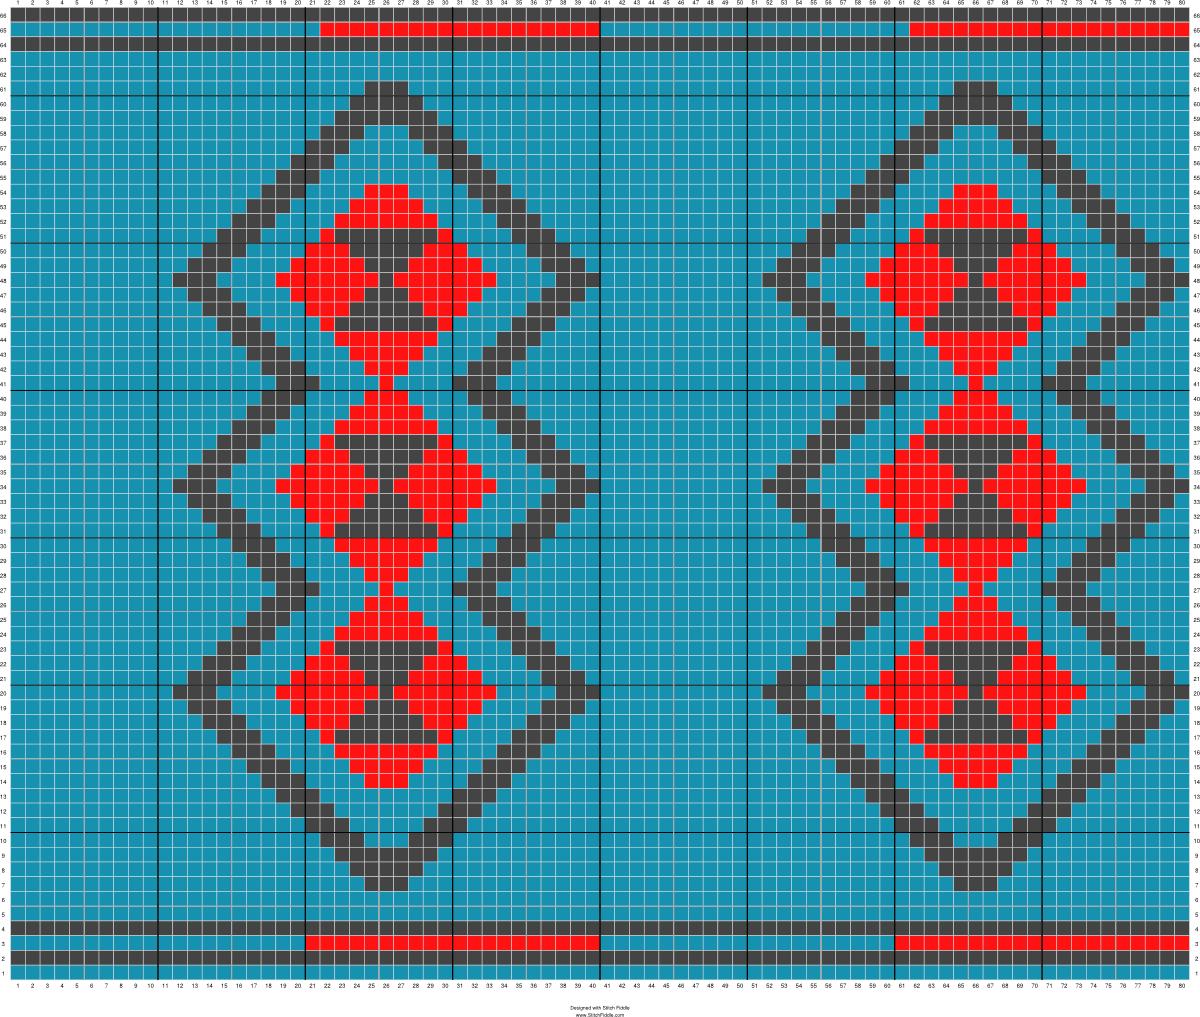 Ruitmotief rood, zwart blauw   wayuu şablon   Pinterest   Tapestry ...